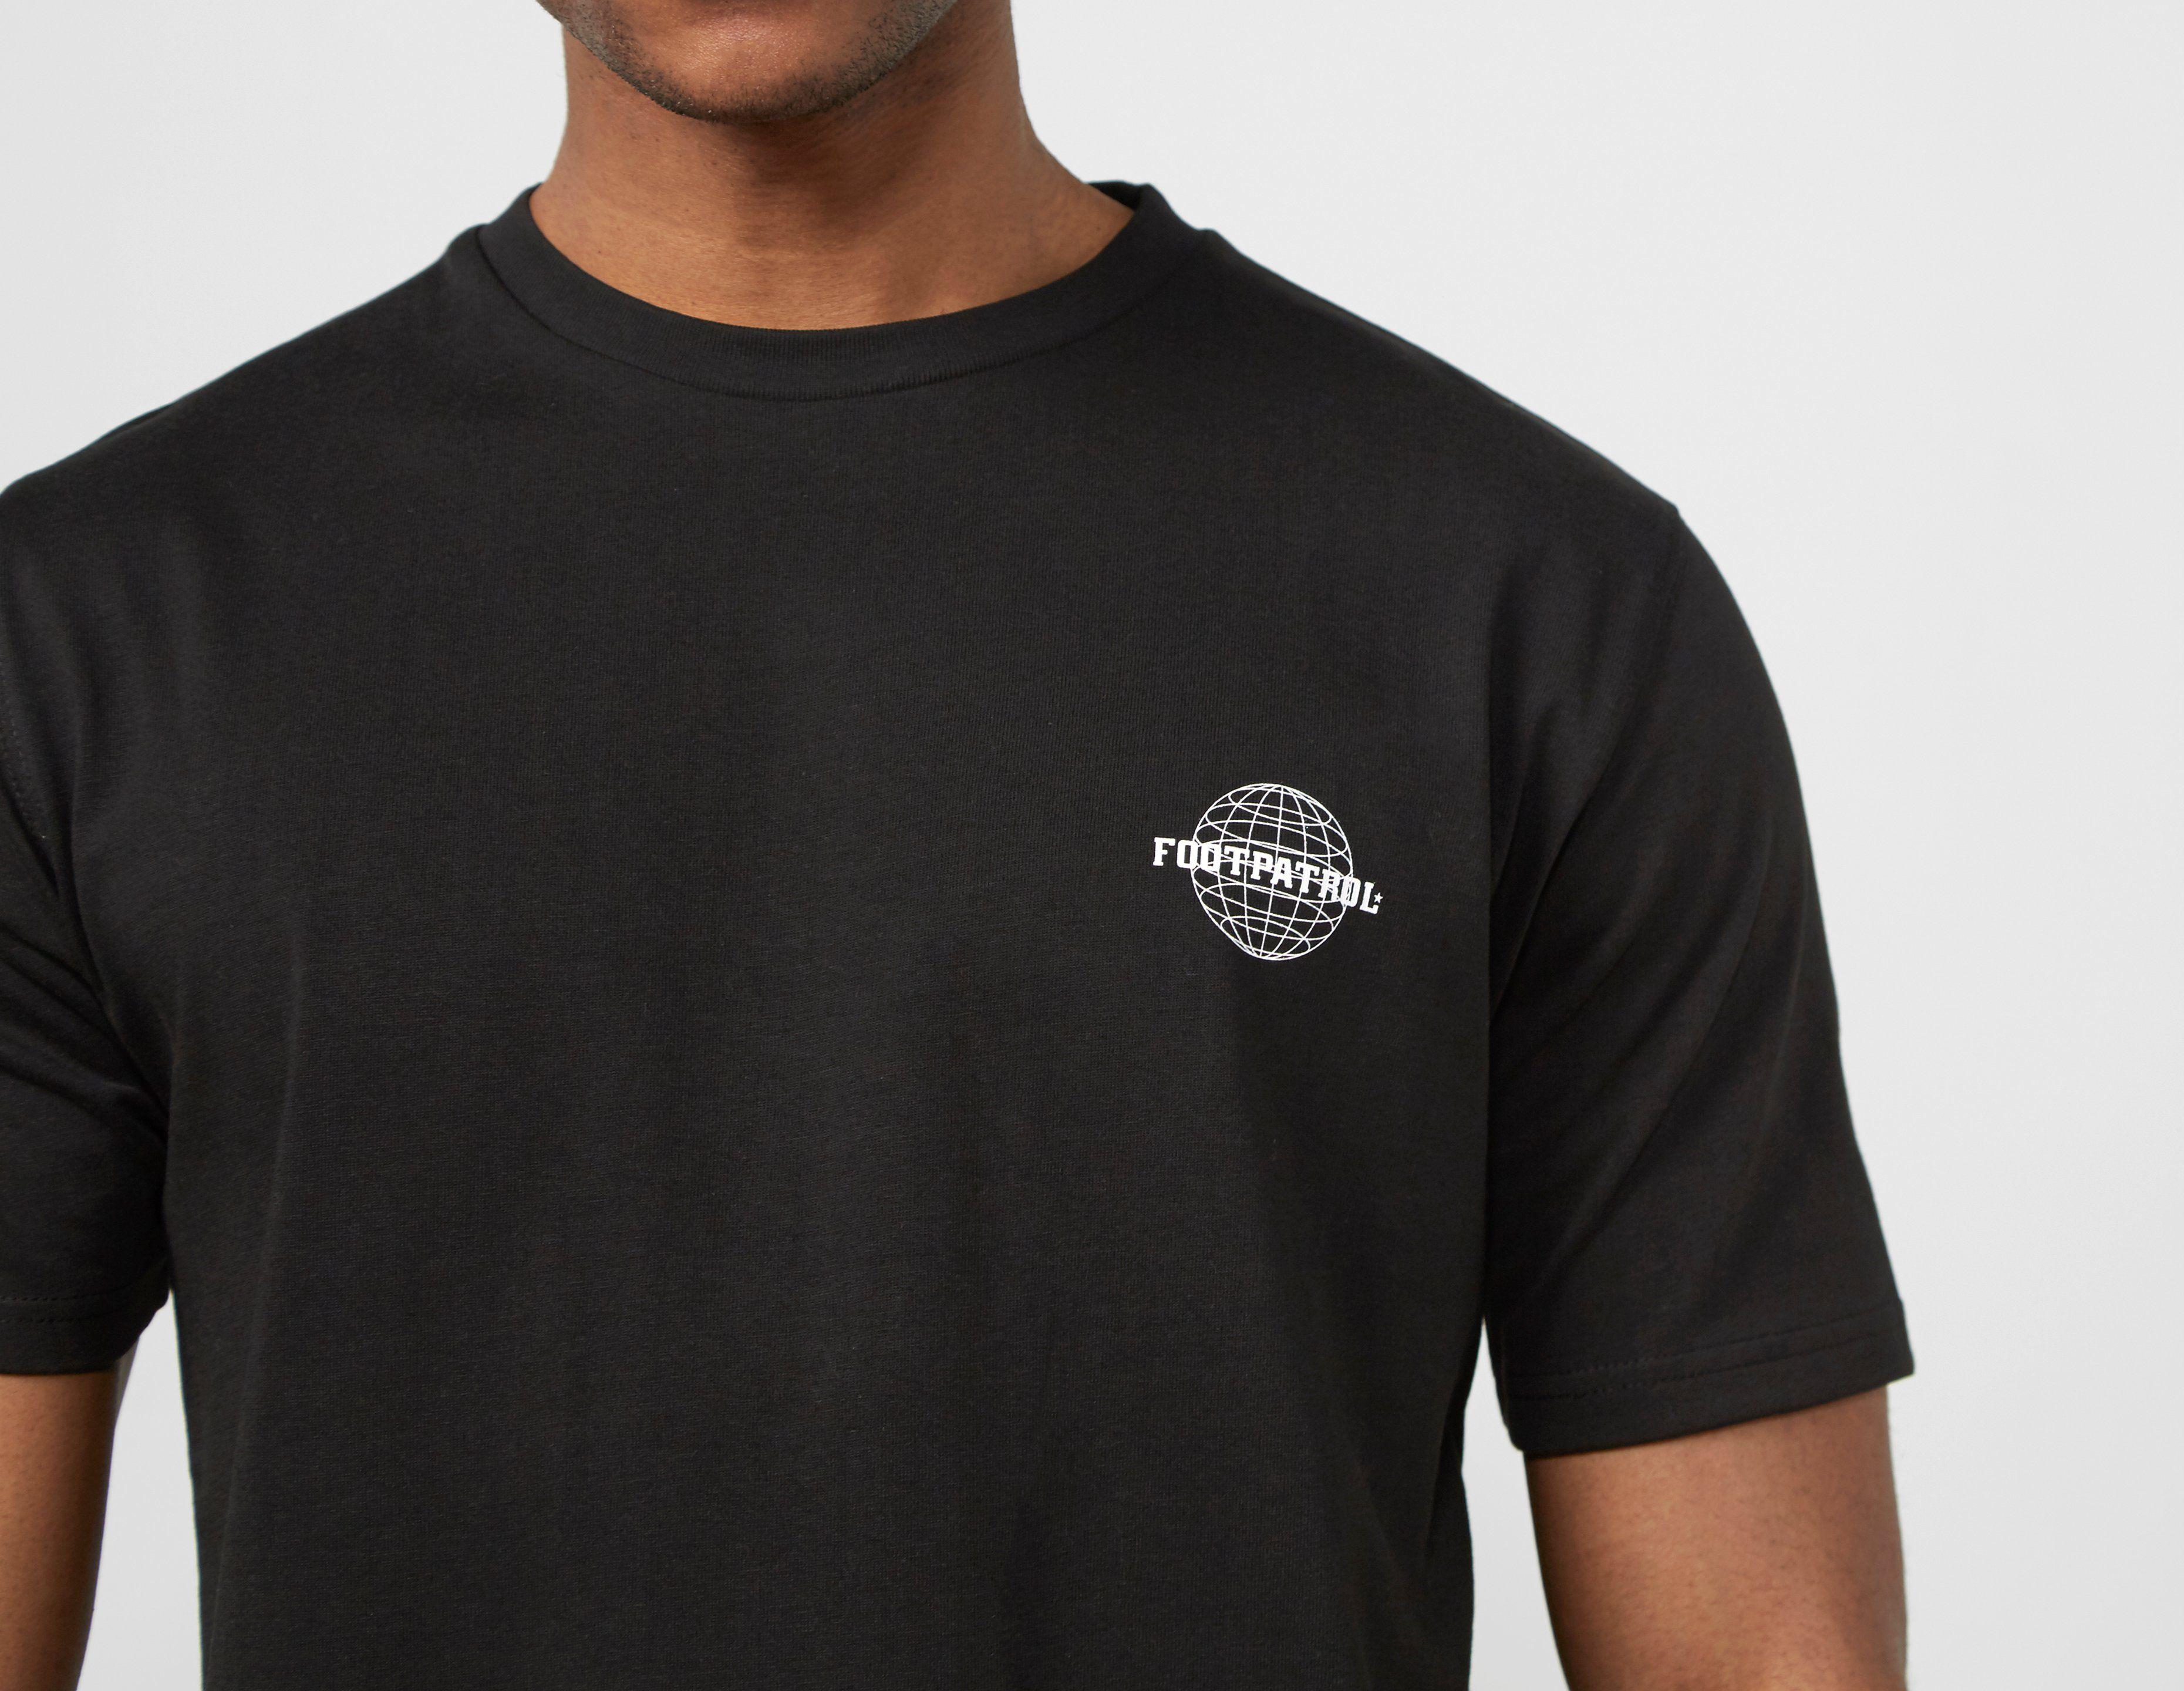 Footpatrol Global T-Shirt